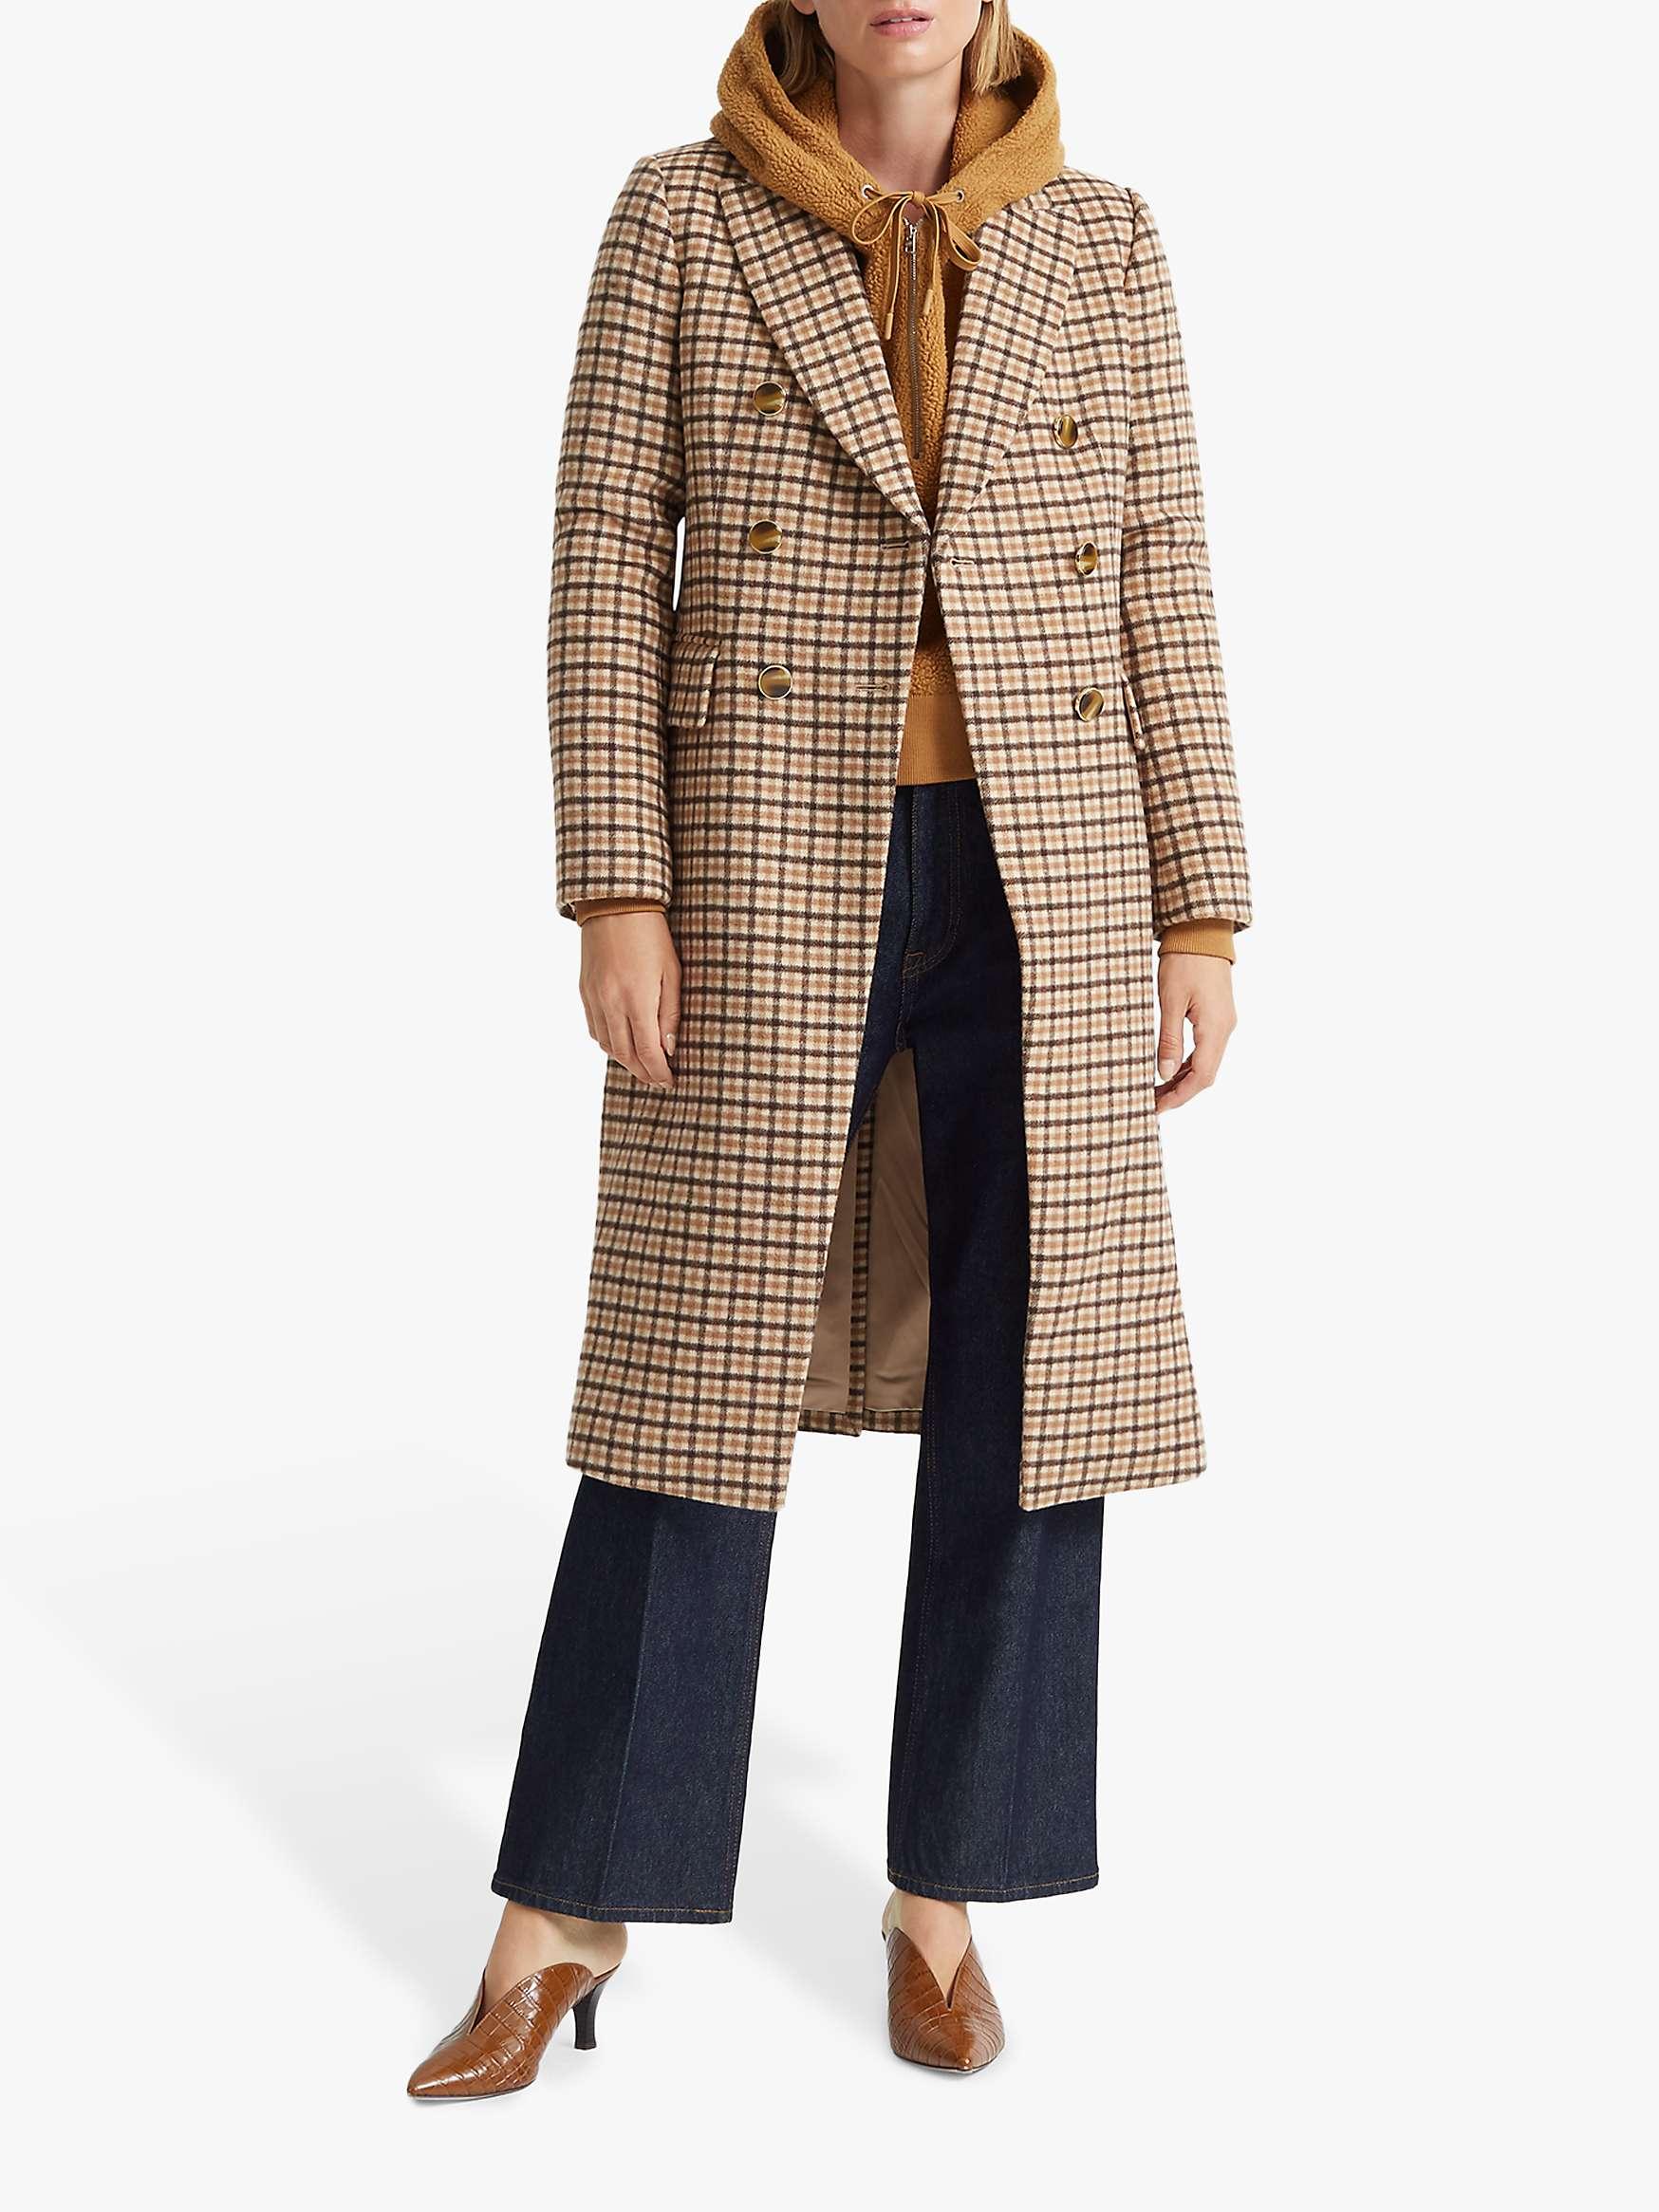 Club Monaco Jemma Check Wool Blend Coat, Camel by John Lewis